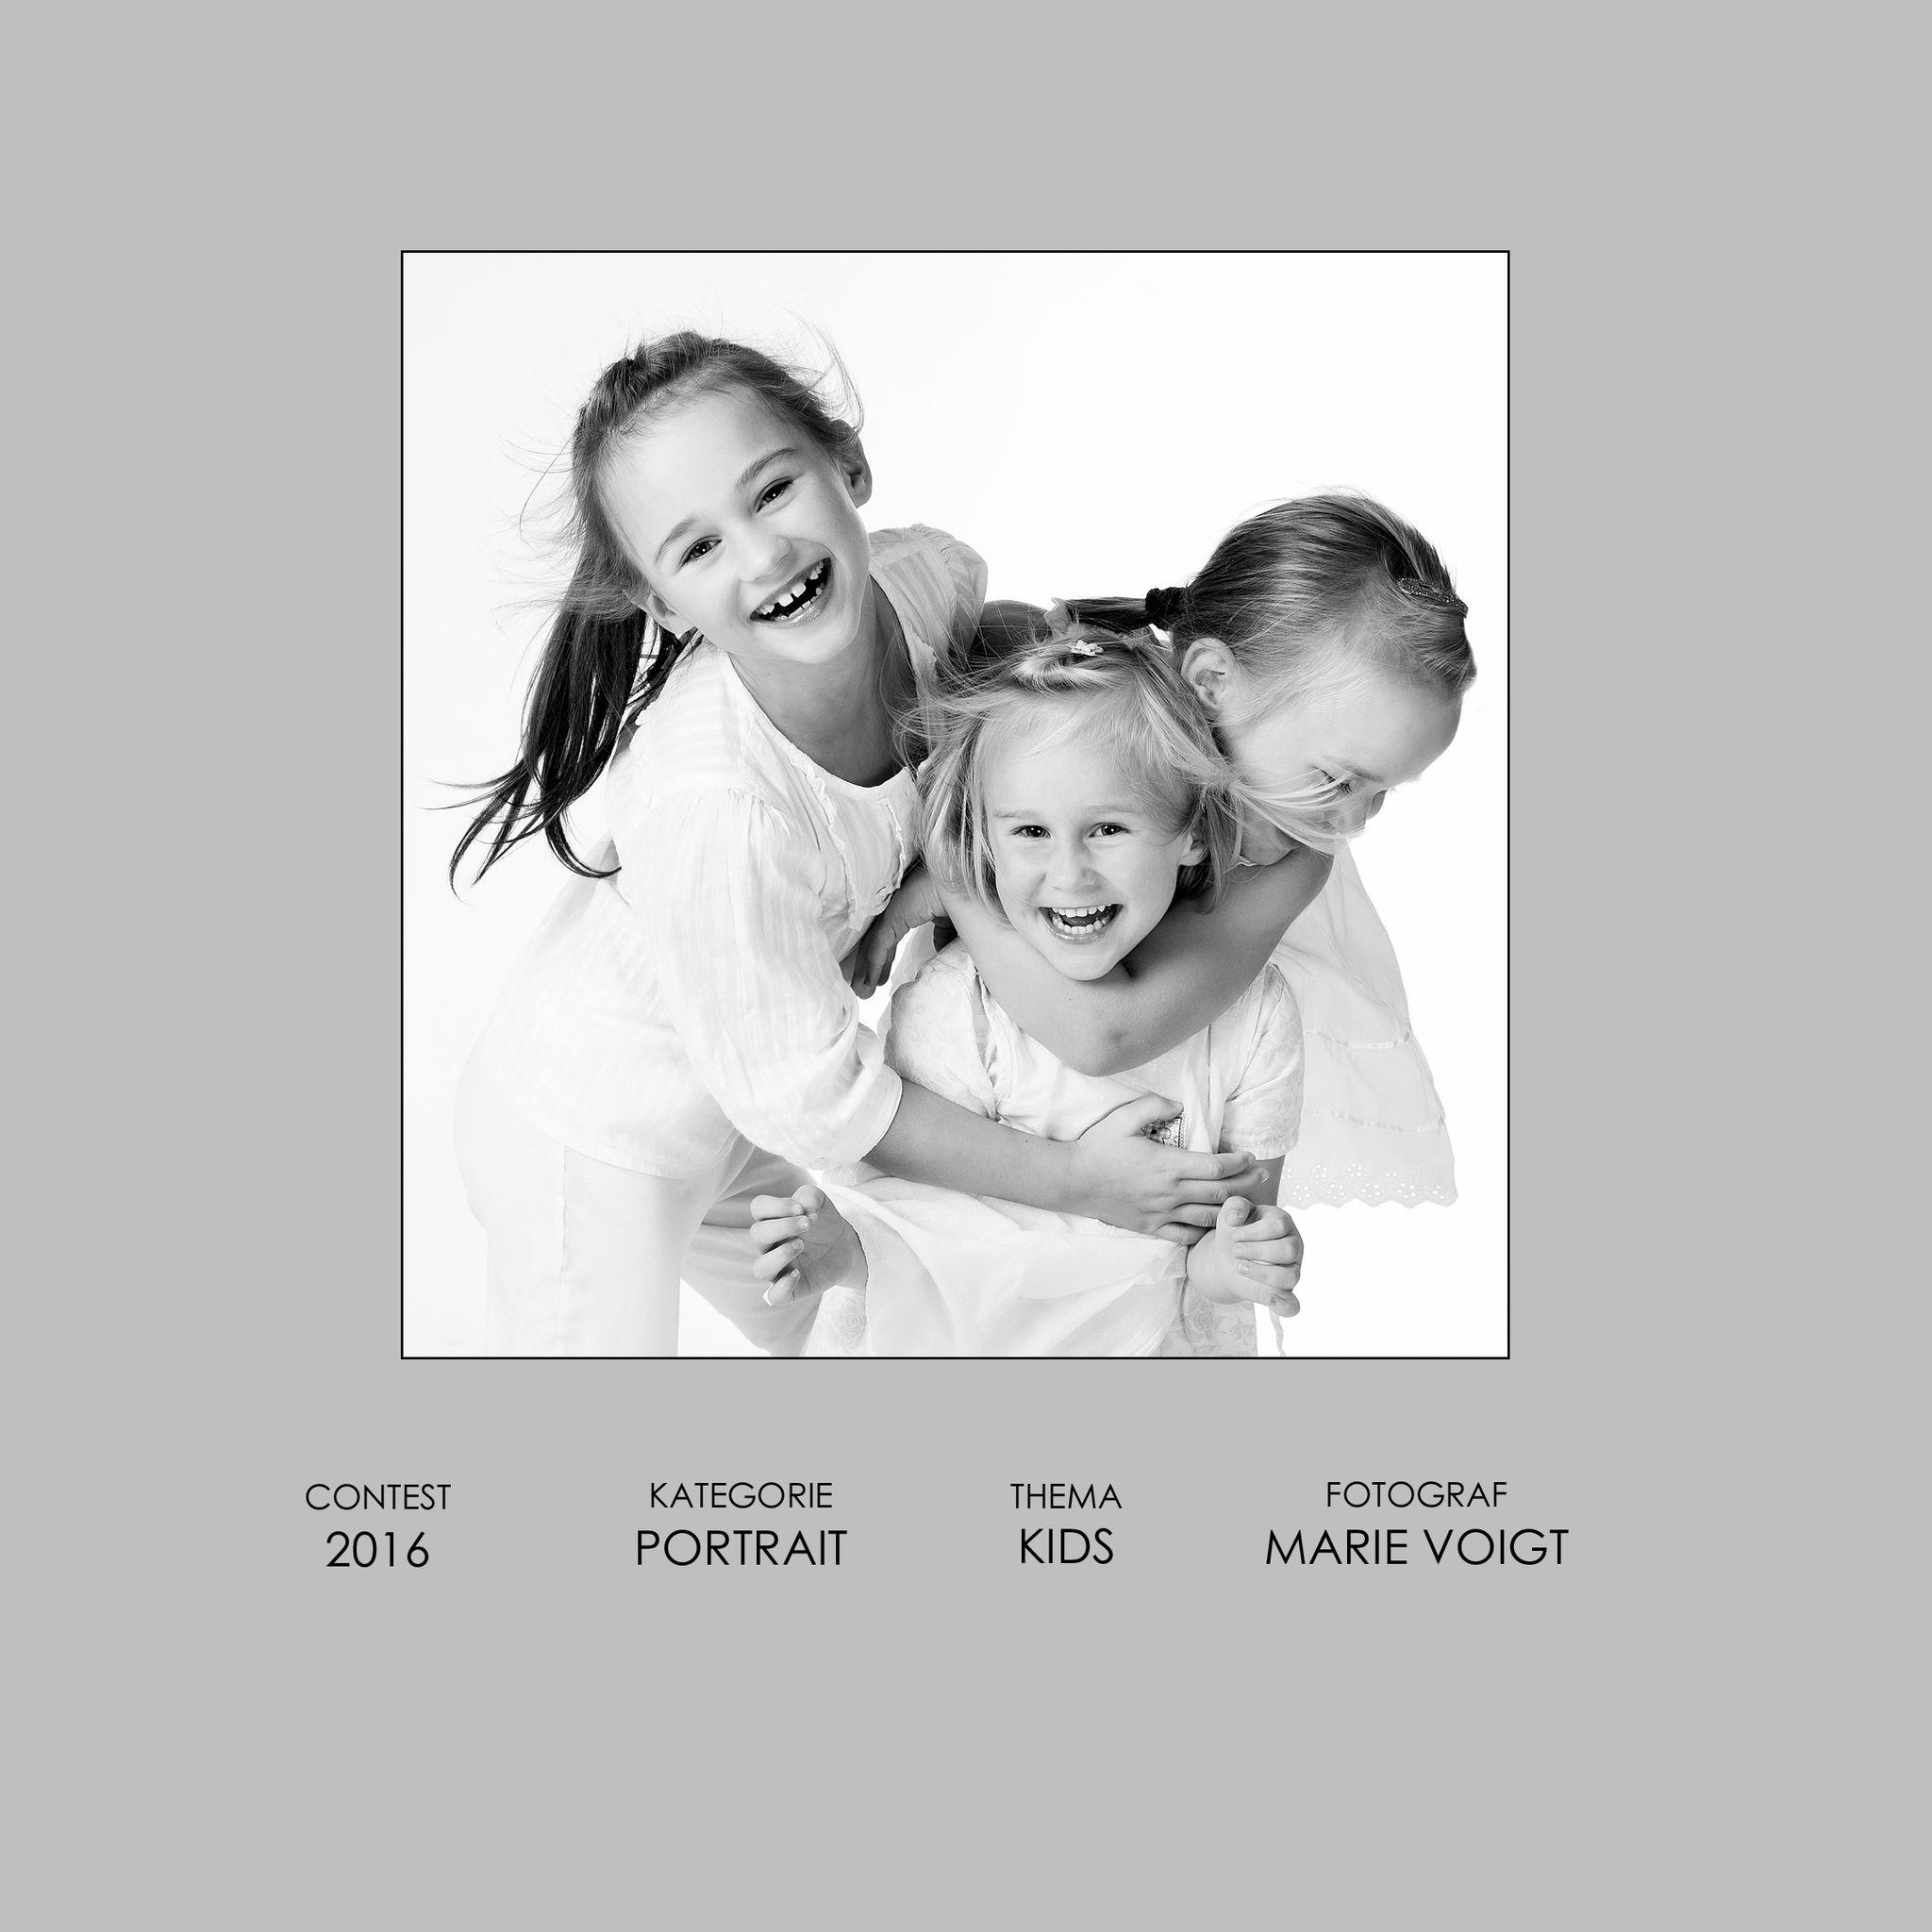 Babyfotografie, Newbornfotografie, Kinderfotografie, Familienfoto, Familie, Portraitfotografie, Businessfotografie, Fotostudio, , Fotograf, Fotografin, Bewerbungsbilder, Familienfotografie, Industriefotografie, Veranstaltungsfotografie, Hochzeitsfotografie, Kinderfotografie, Fotograf, Fotografie, Foto, Jena, Thueringen,